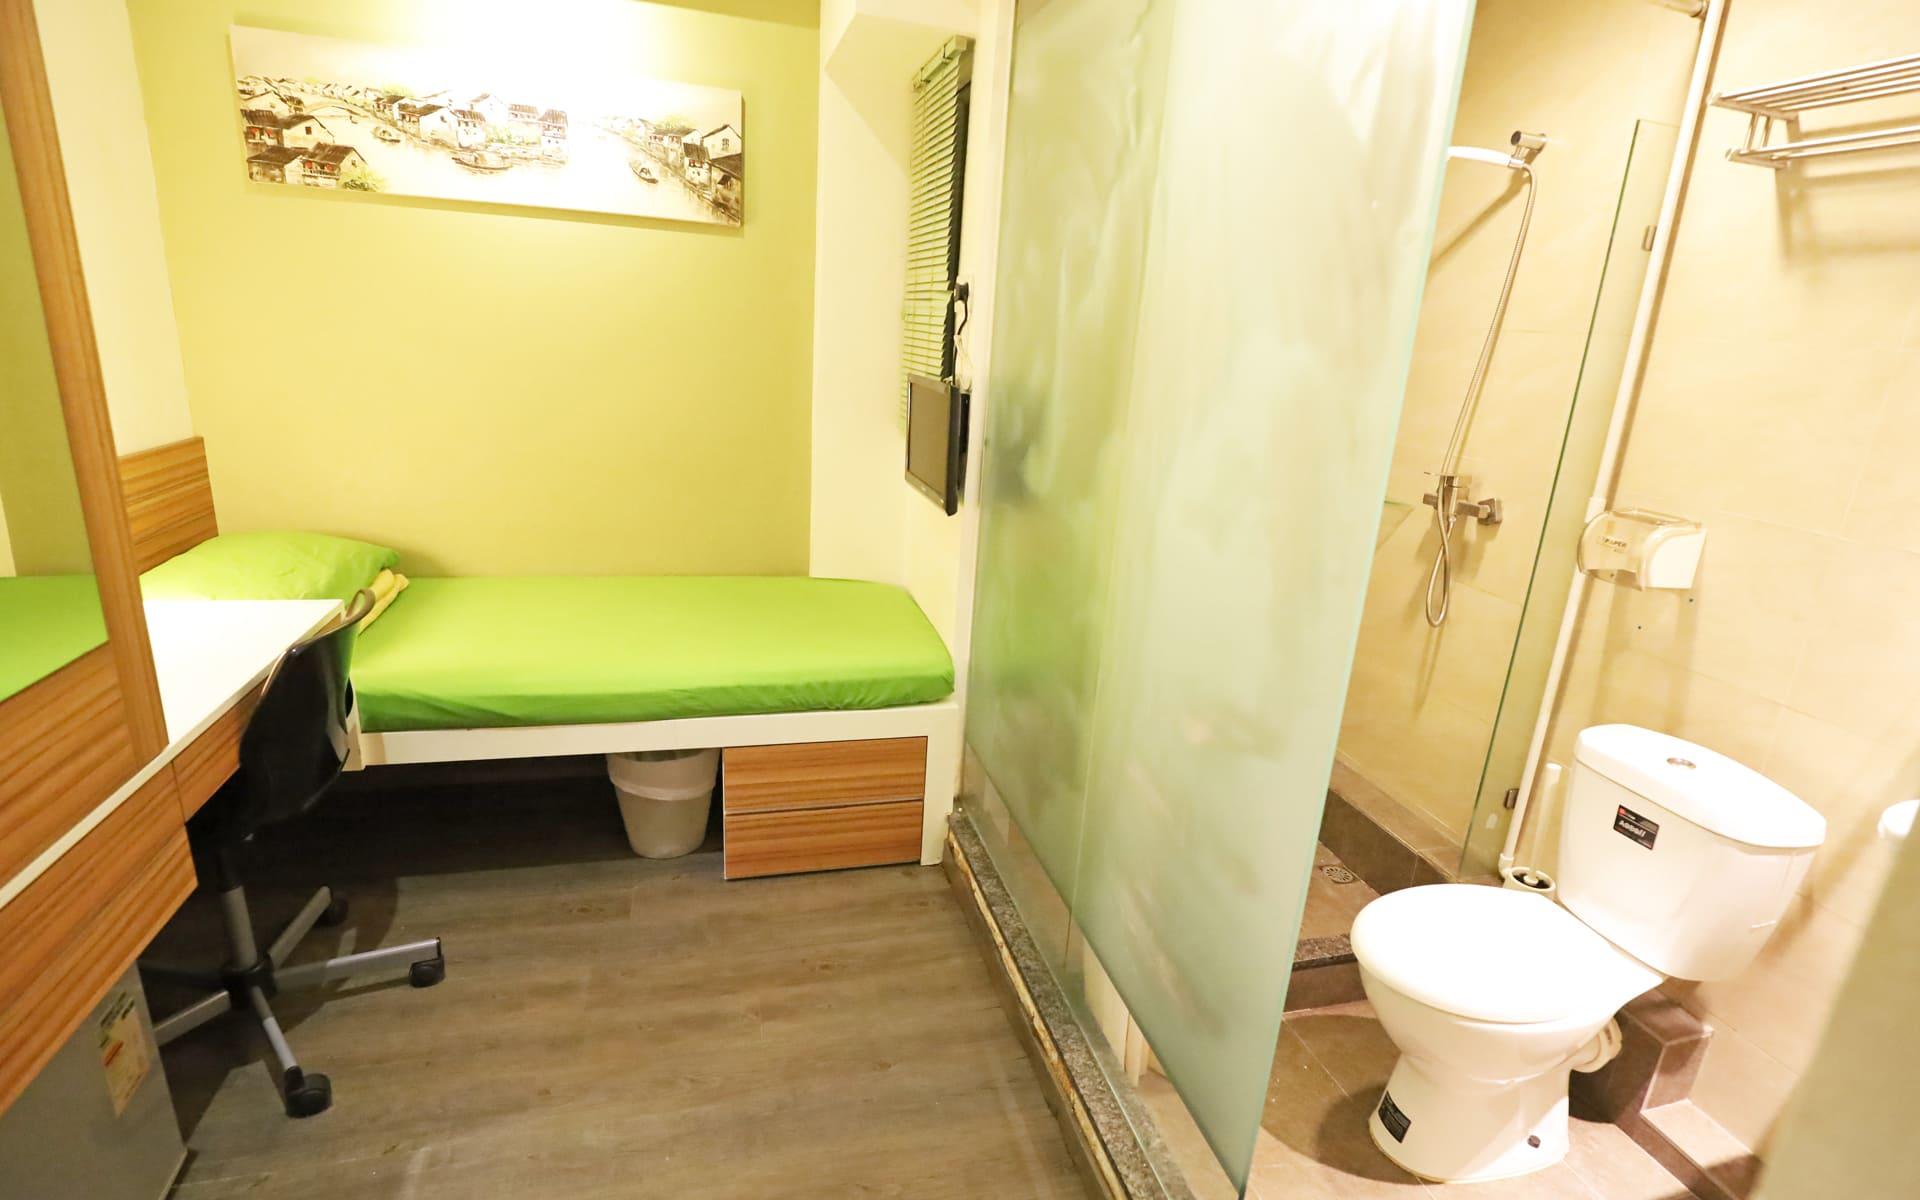 hk_service_apartment_4593739461596710076.jpg